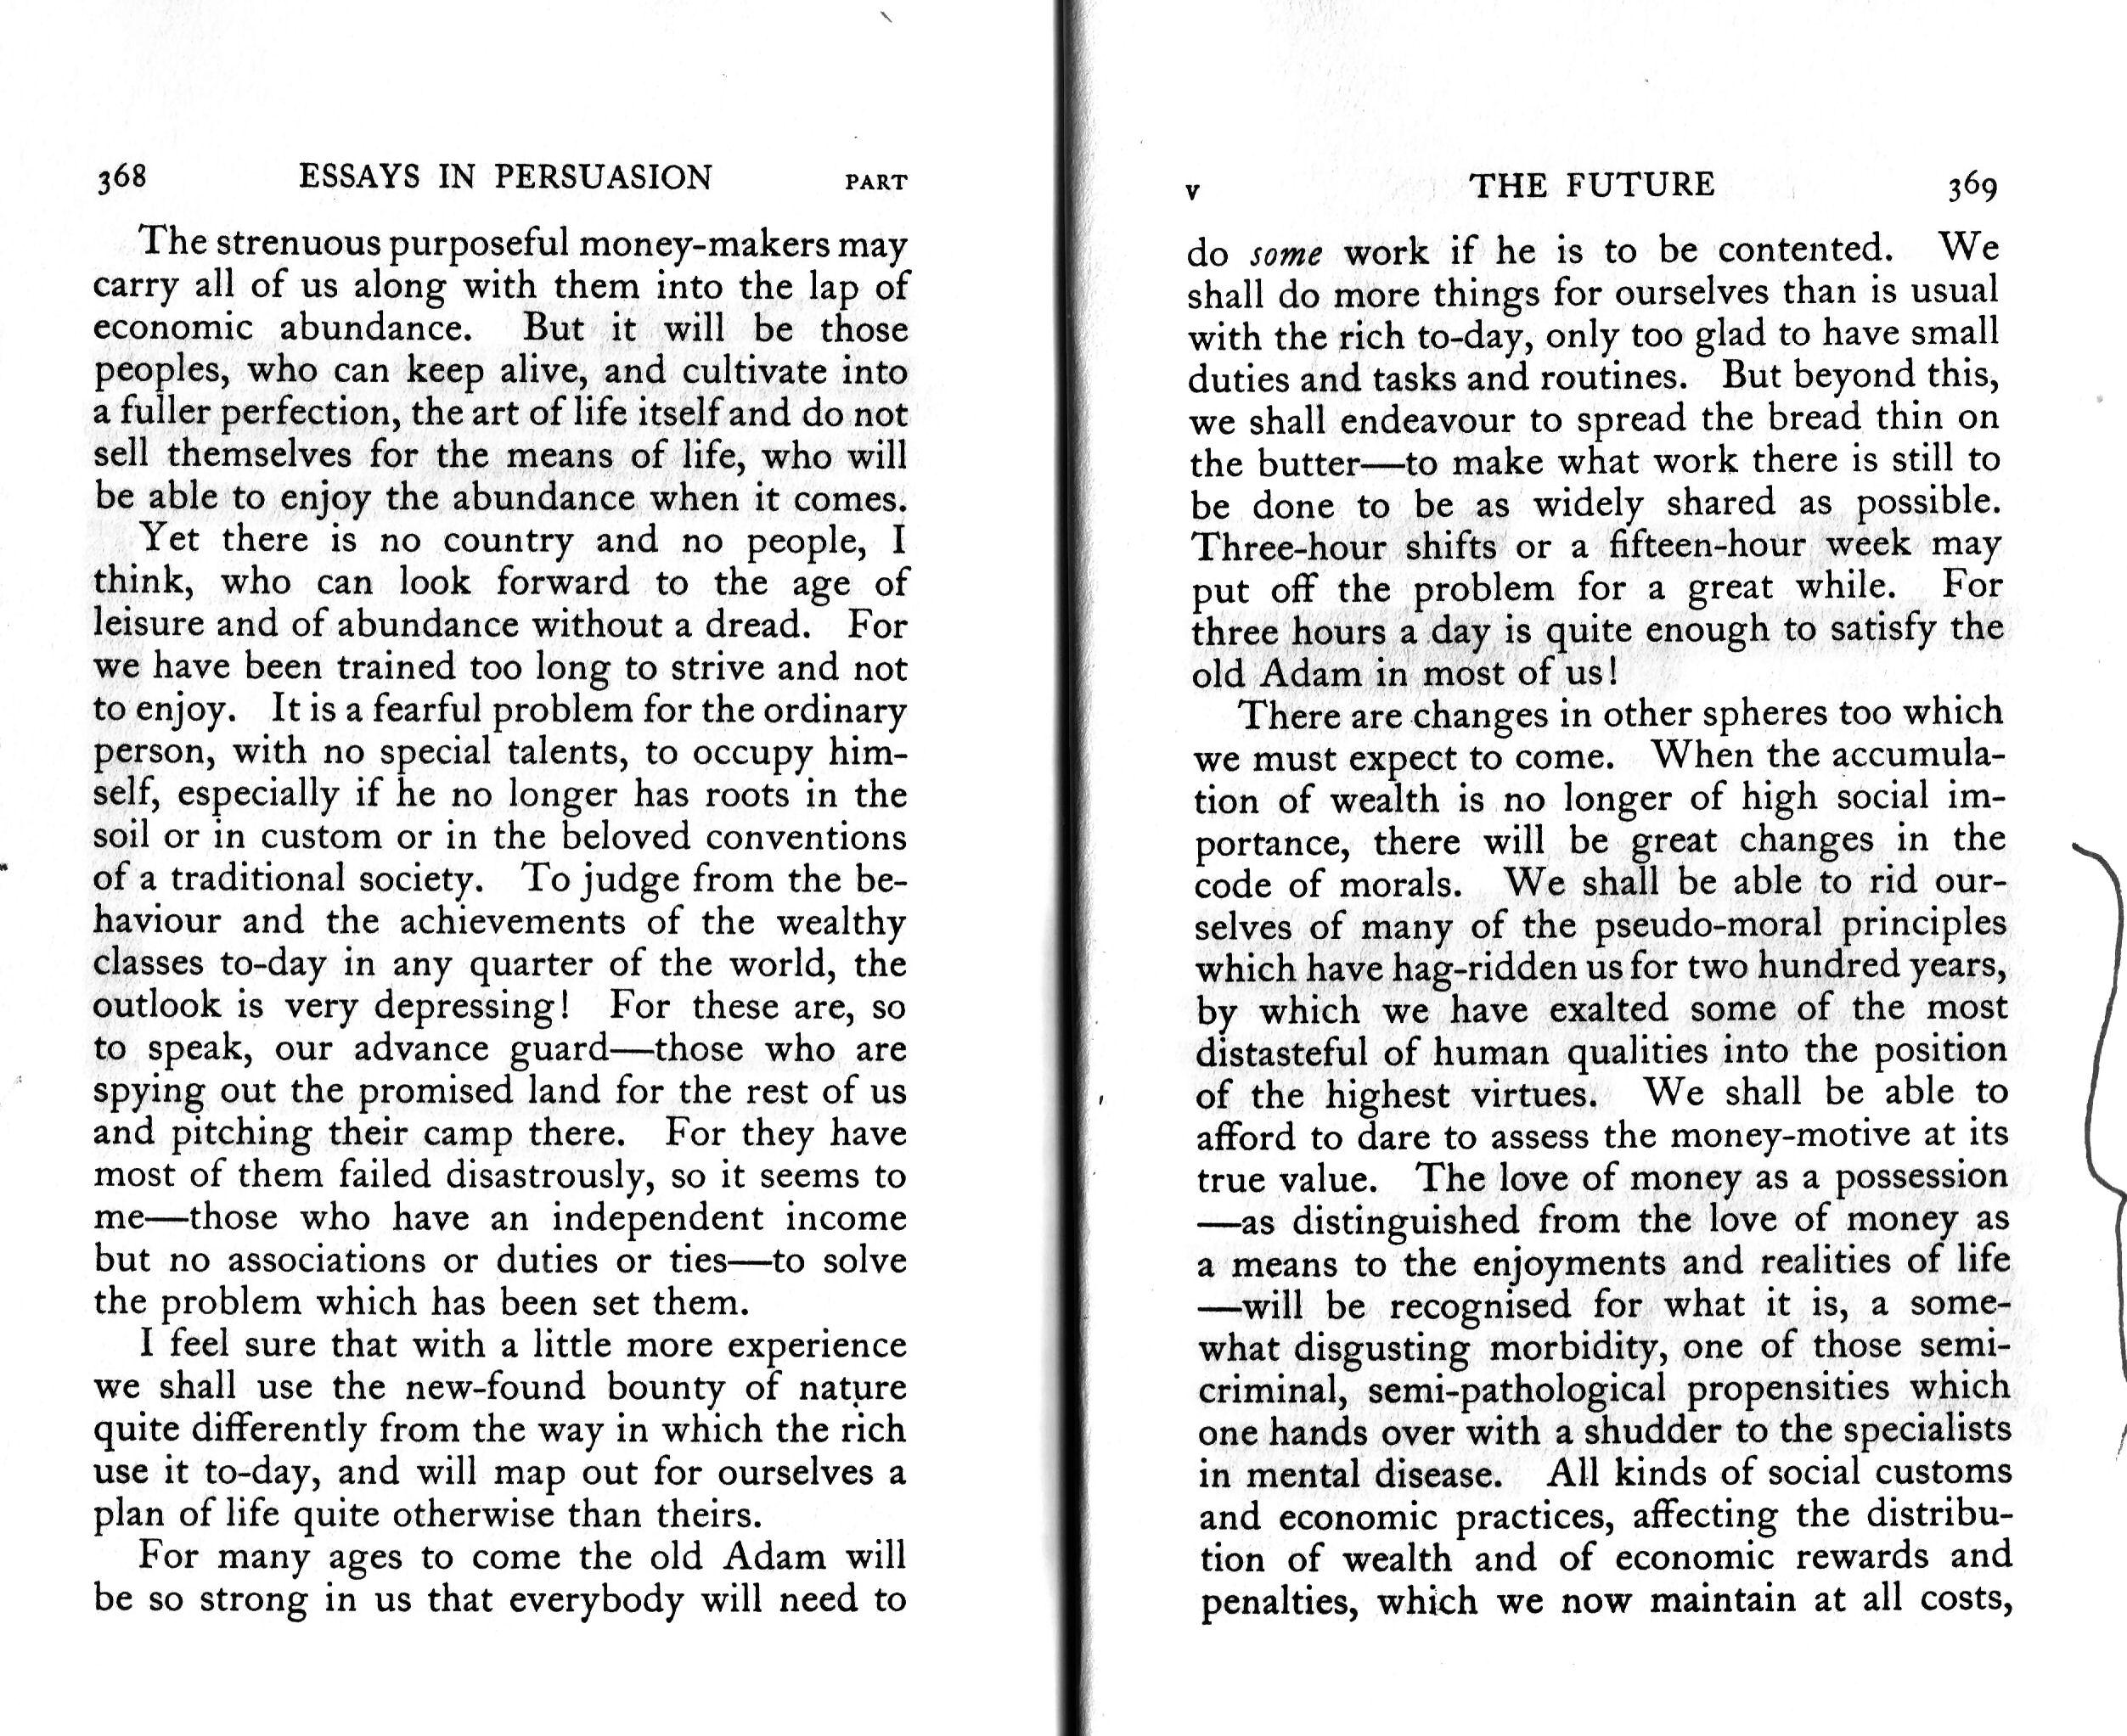 026 Essays In Persuasion Essay Remarkable Audiobook Pdf John Maynard Keynes Summary Full